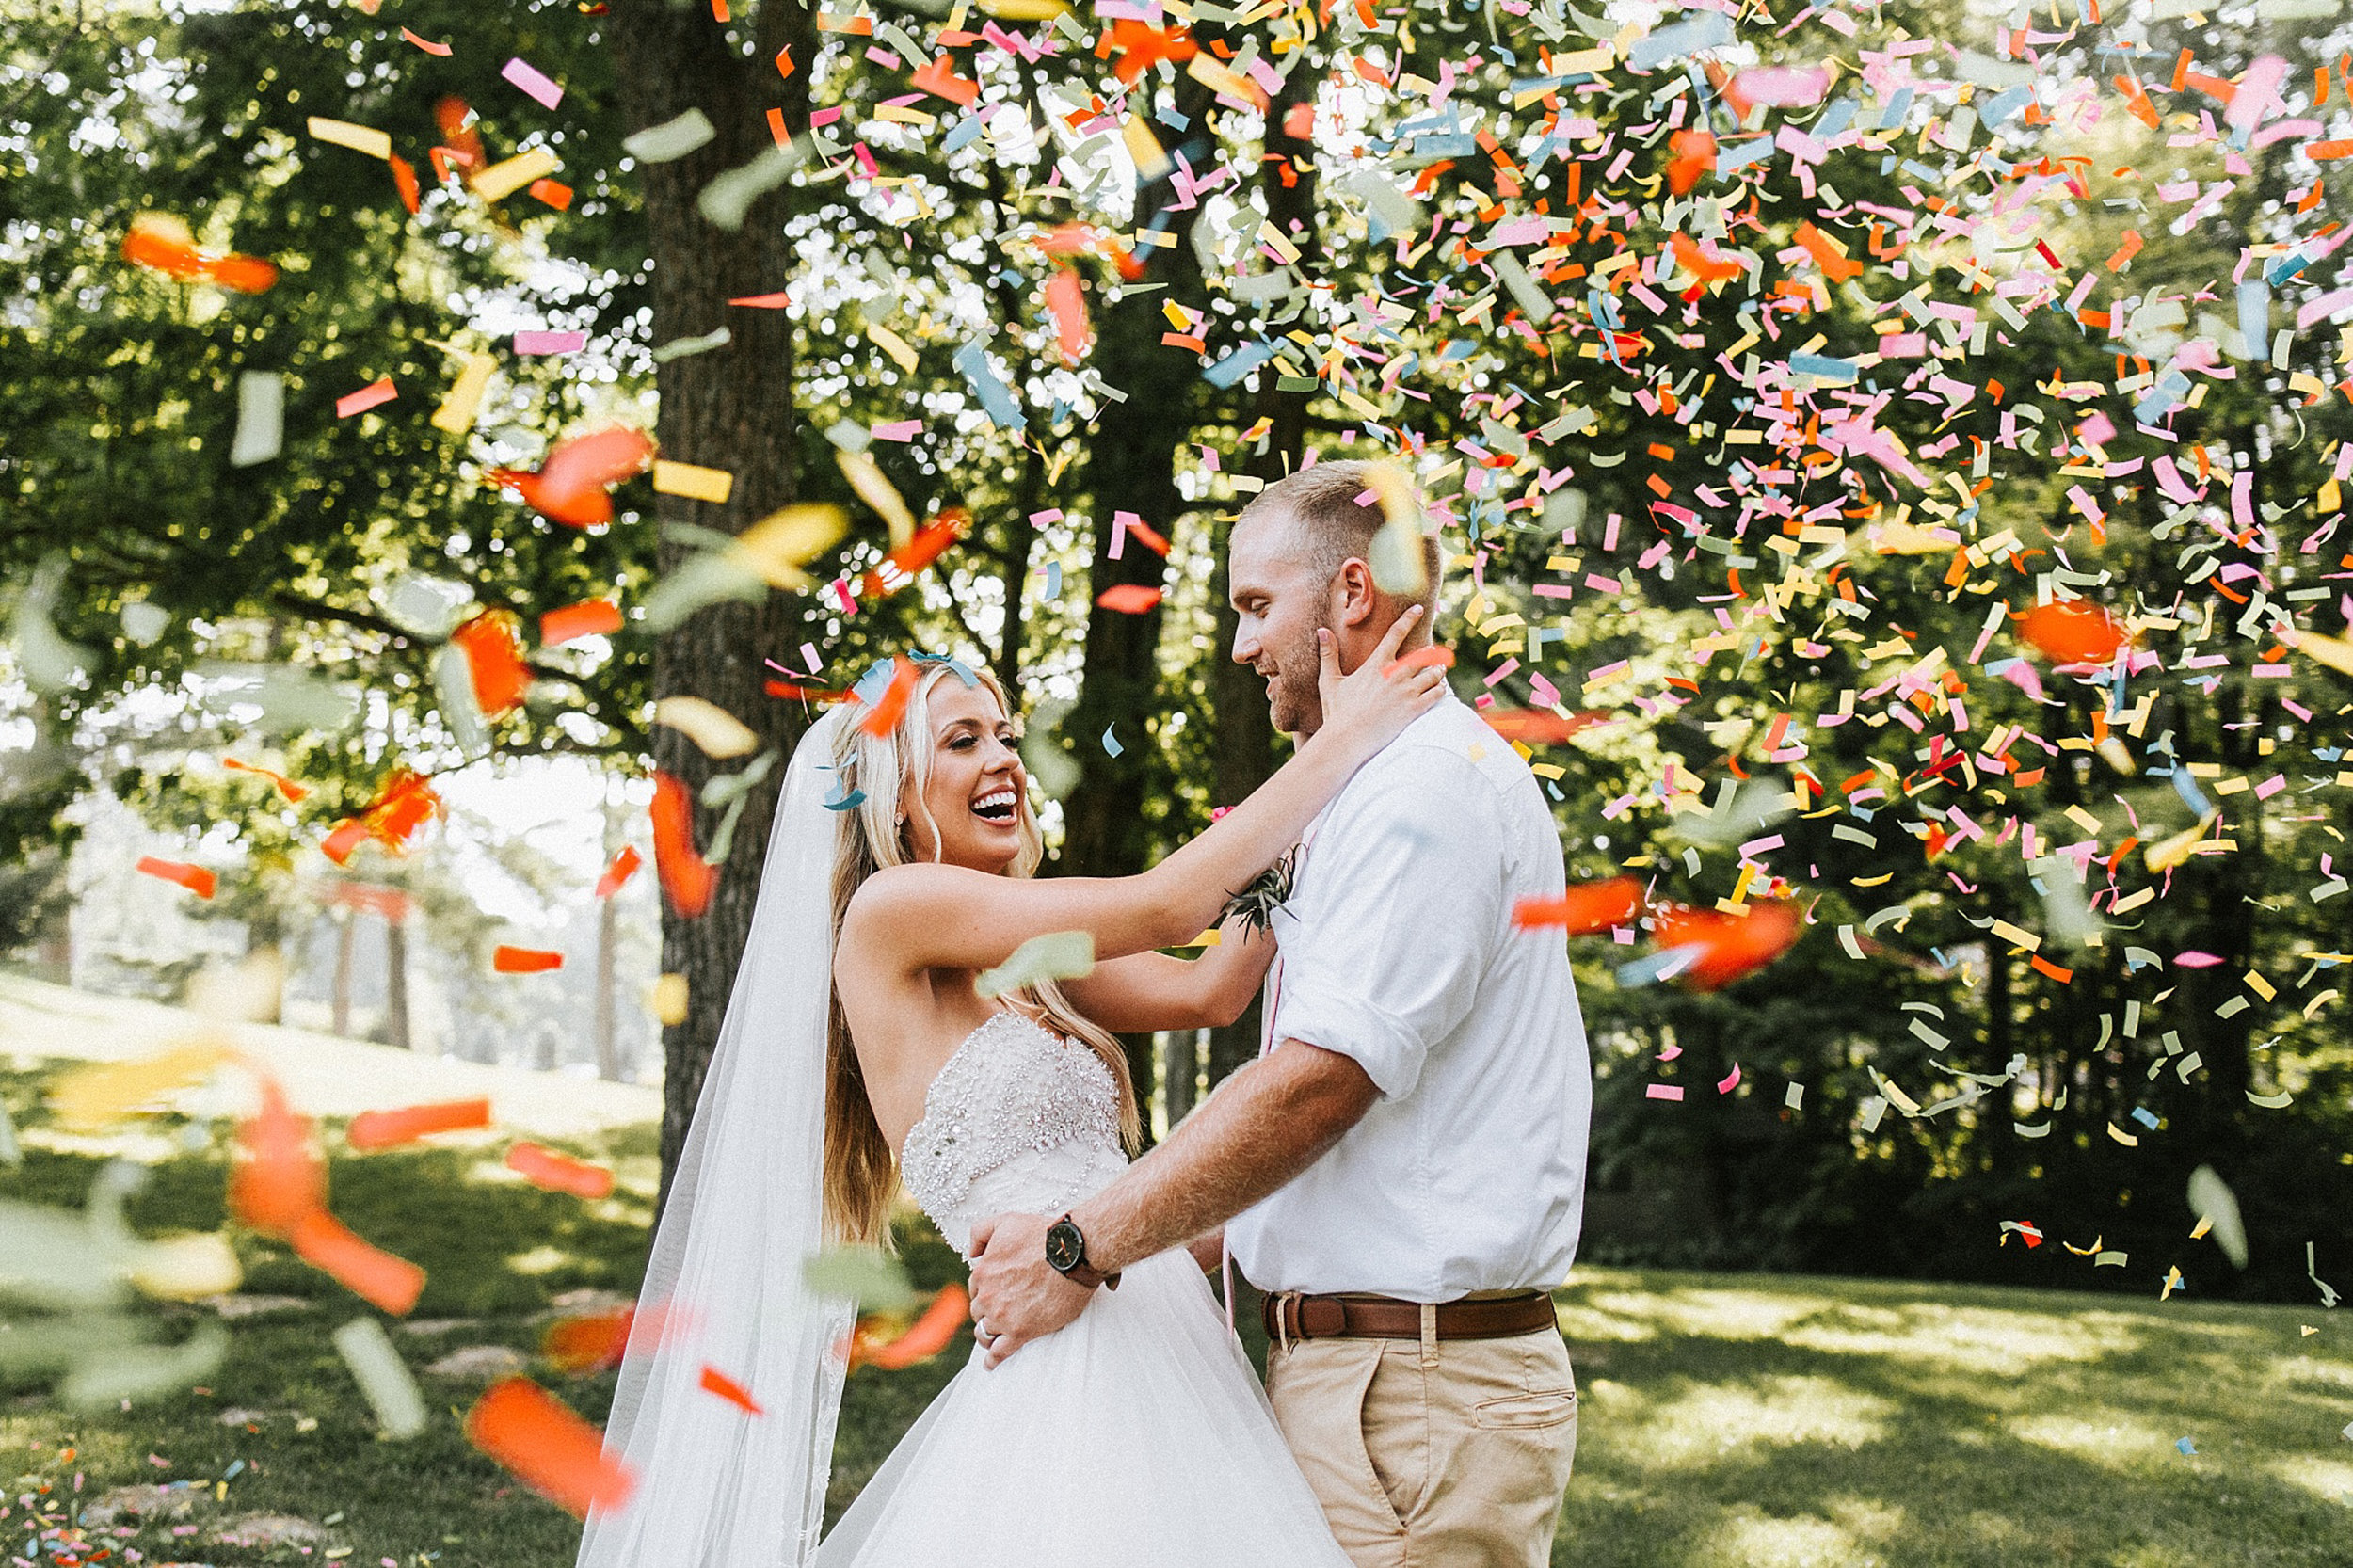 Brooke Townsend Photography - Cincinnati Wedding Photographer (97 of 153).jpg